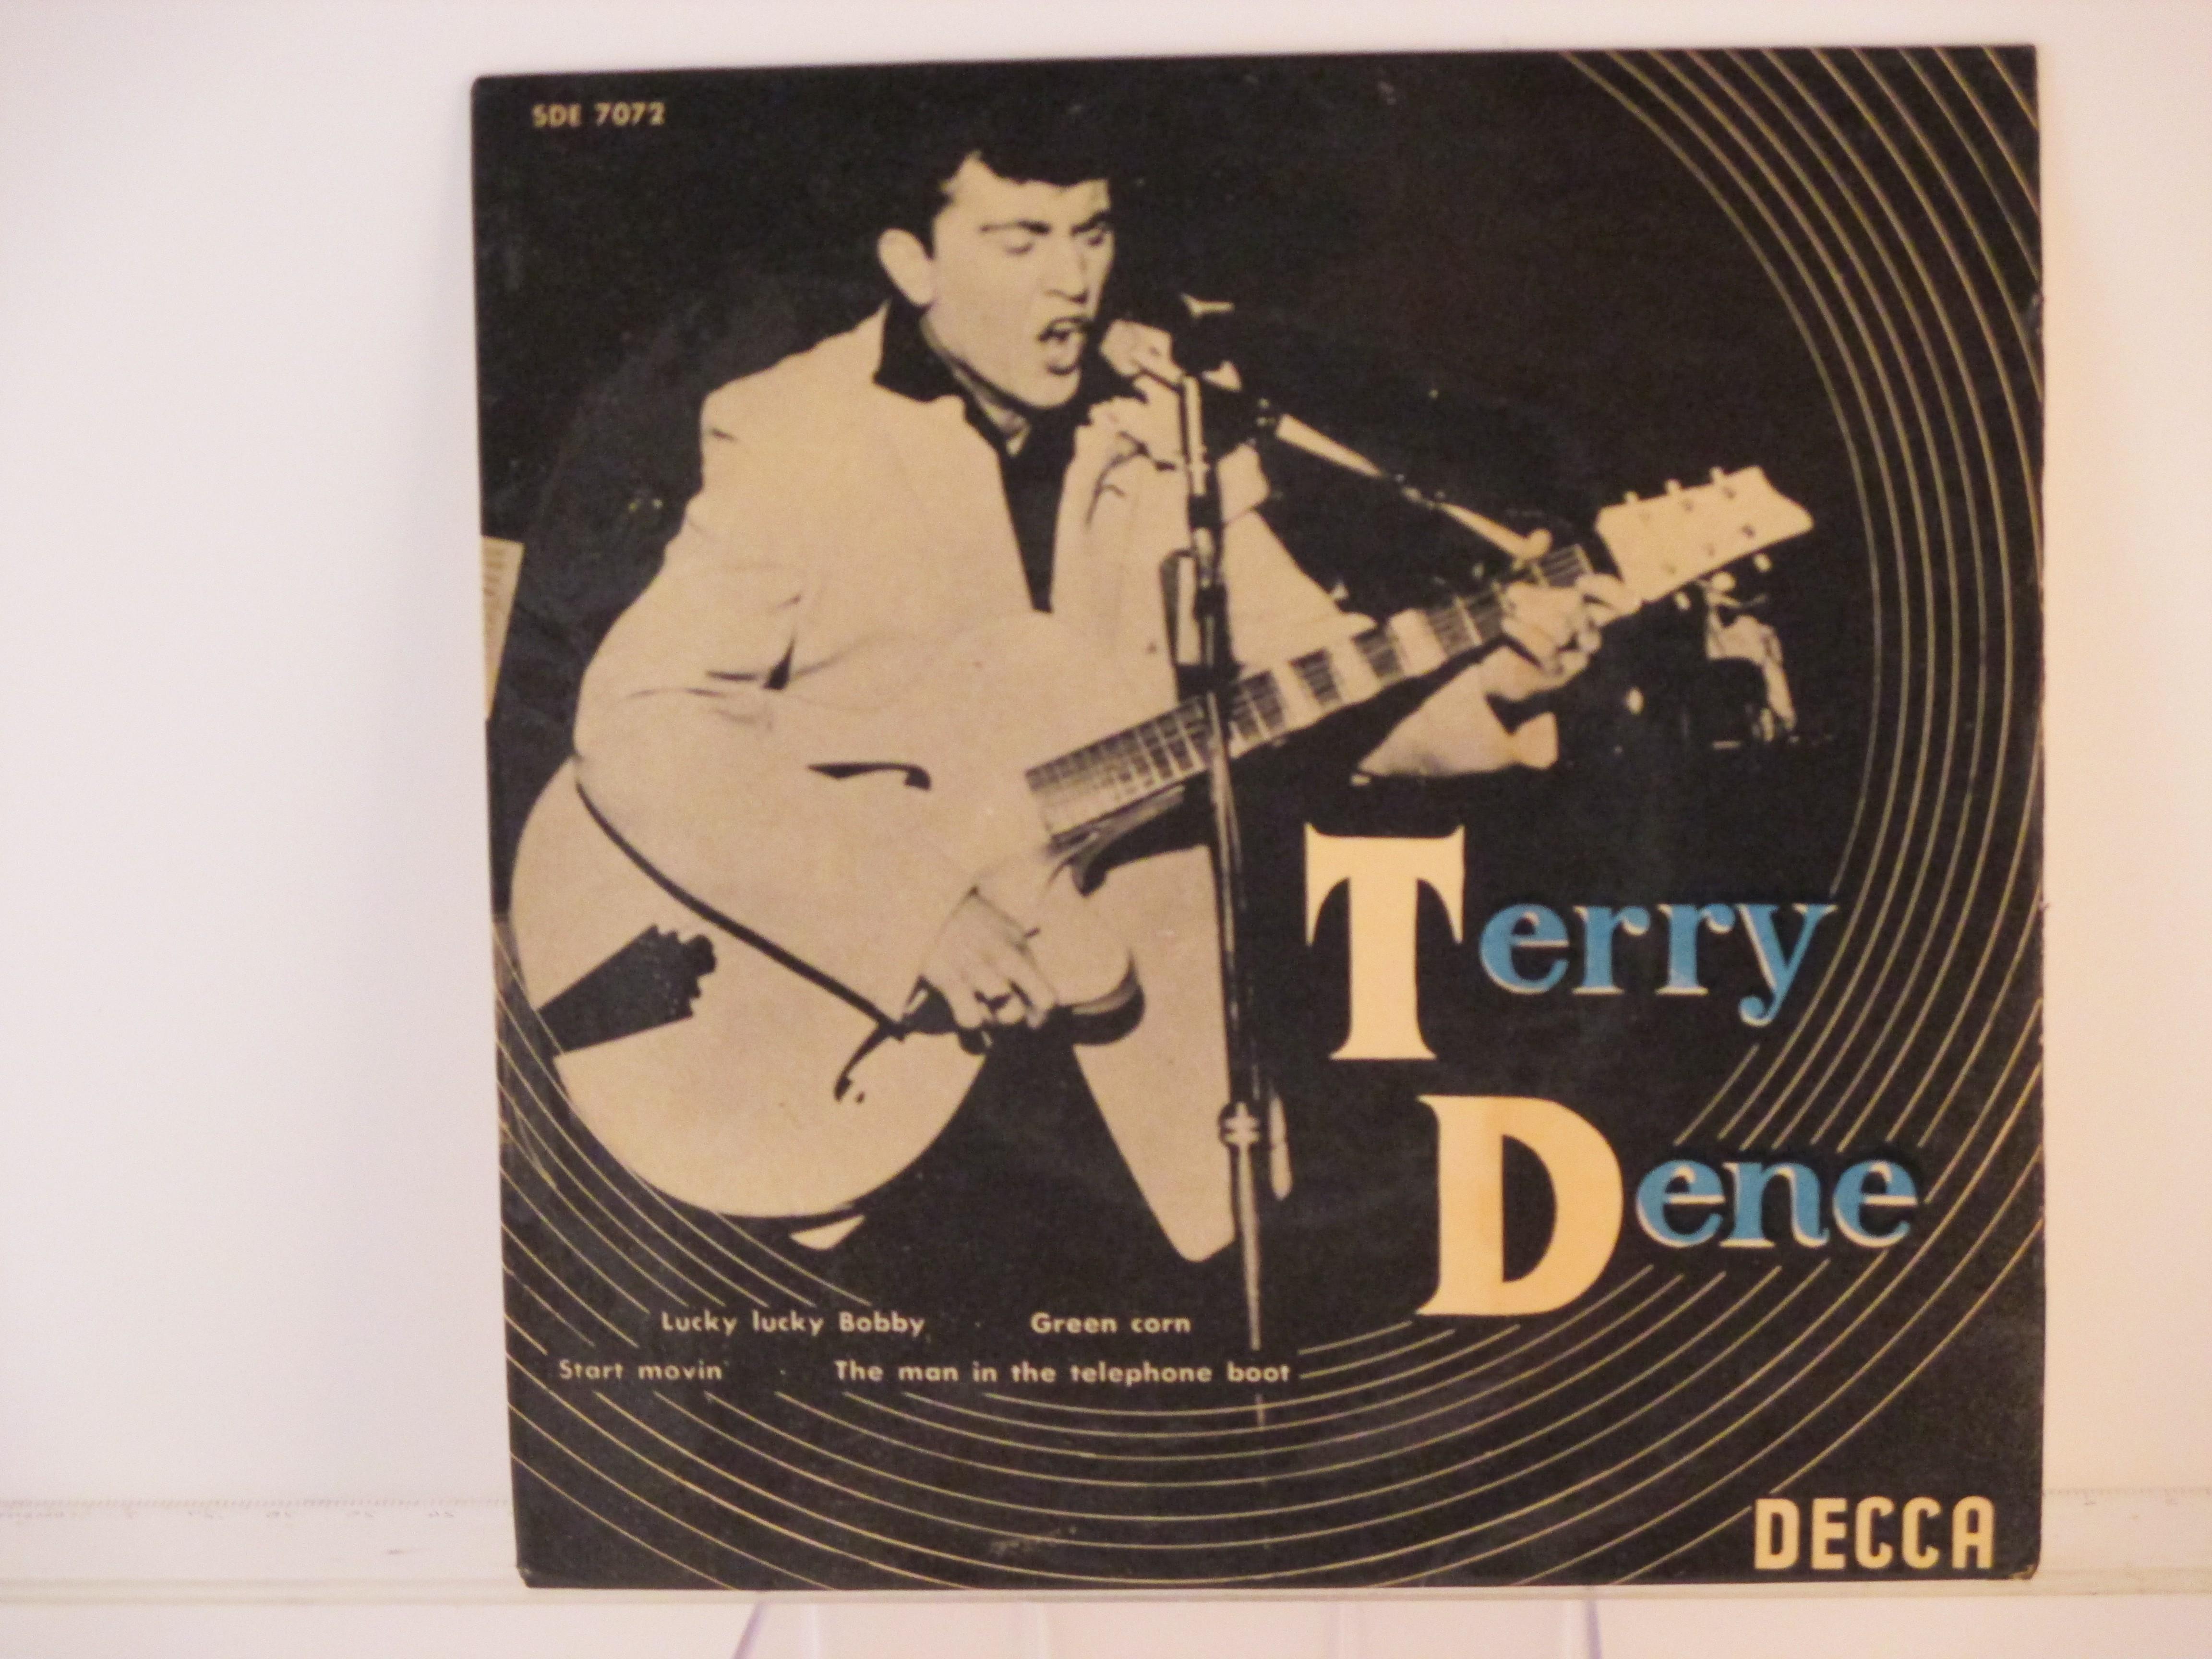 TERRY DENE : (EP) Lucky lucky Bobby / Green corn / Start movin' / The man in the telephone boot